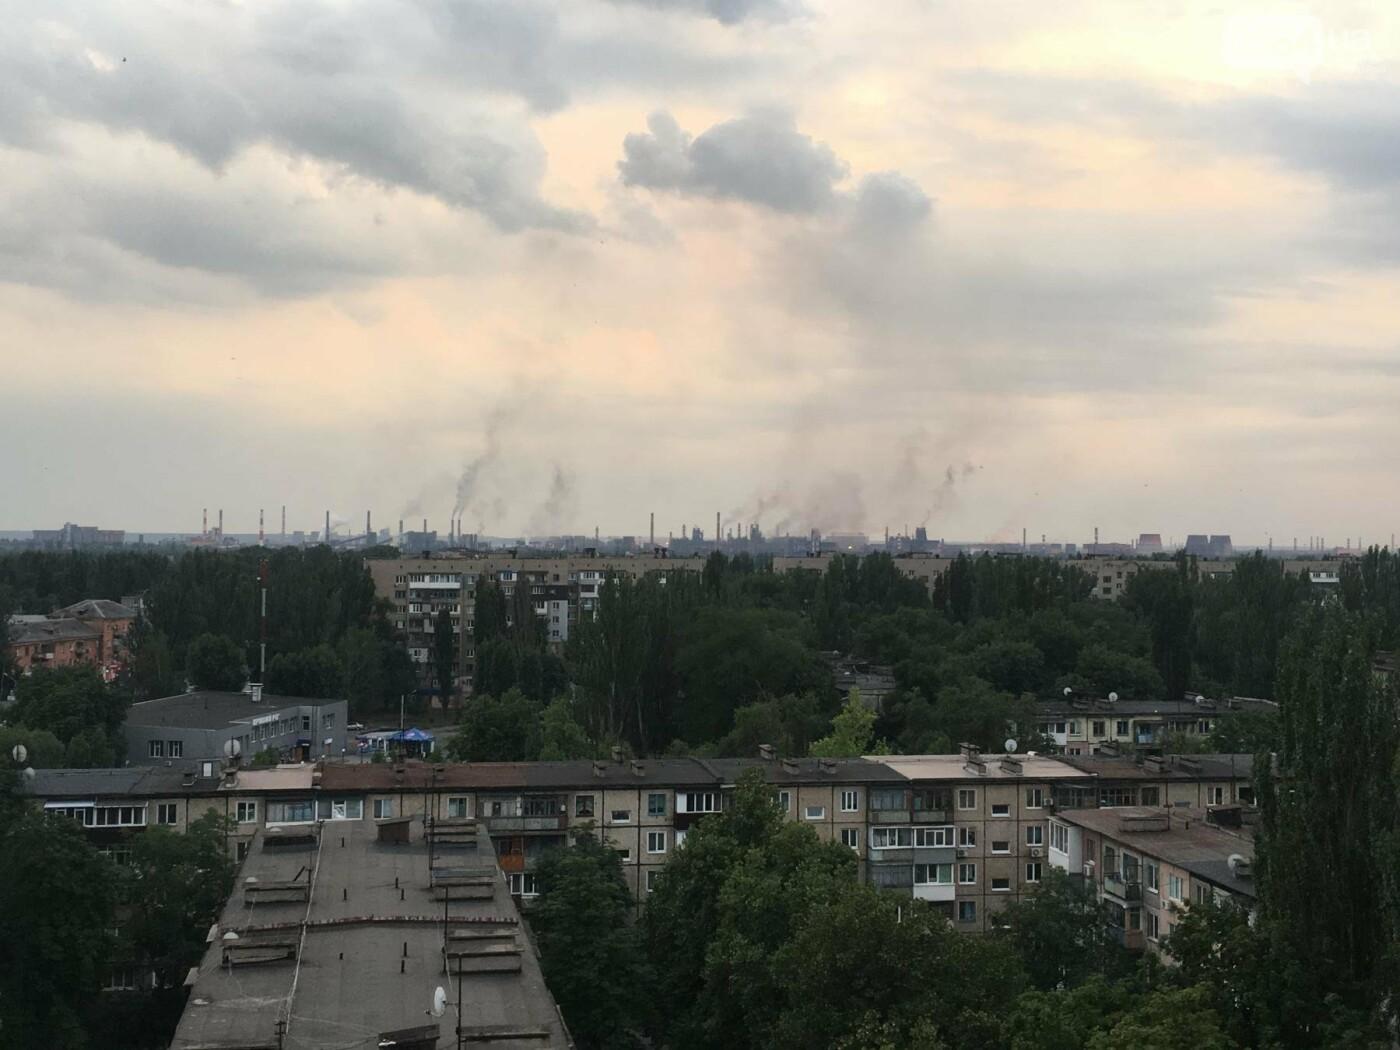 Сотни криворожан встречали закат на крыше отеля под мелодии джаза, - ФОТО, ВИДЕО, фото-28